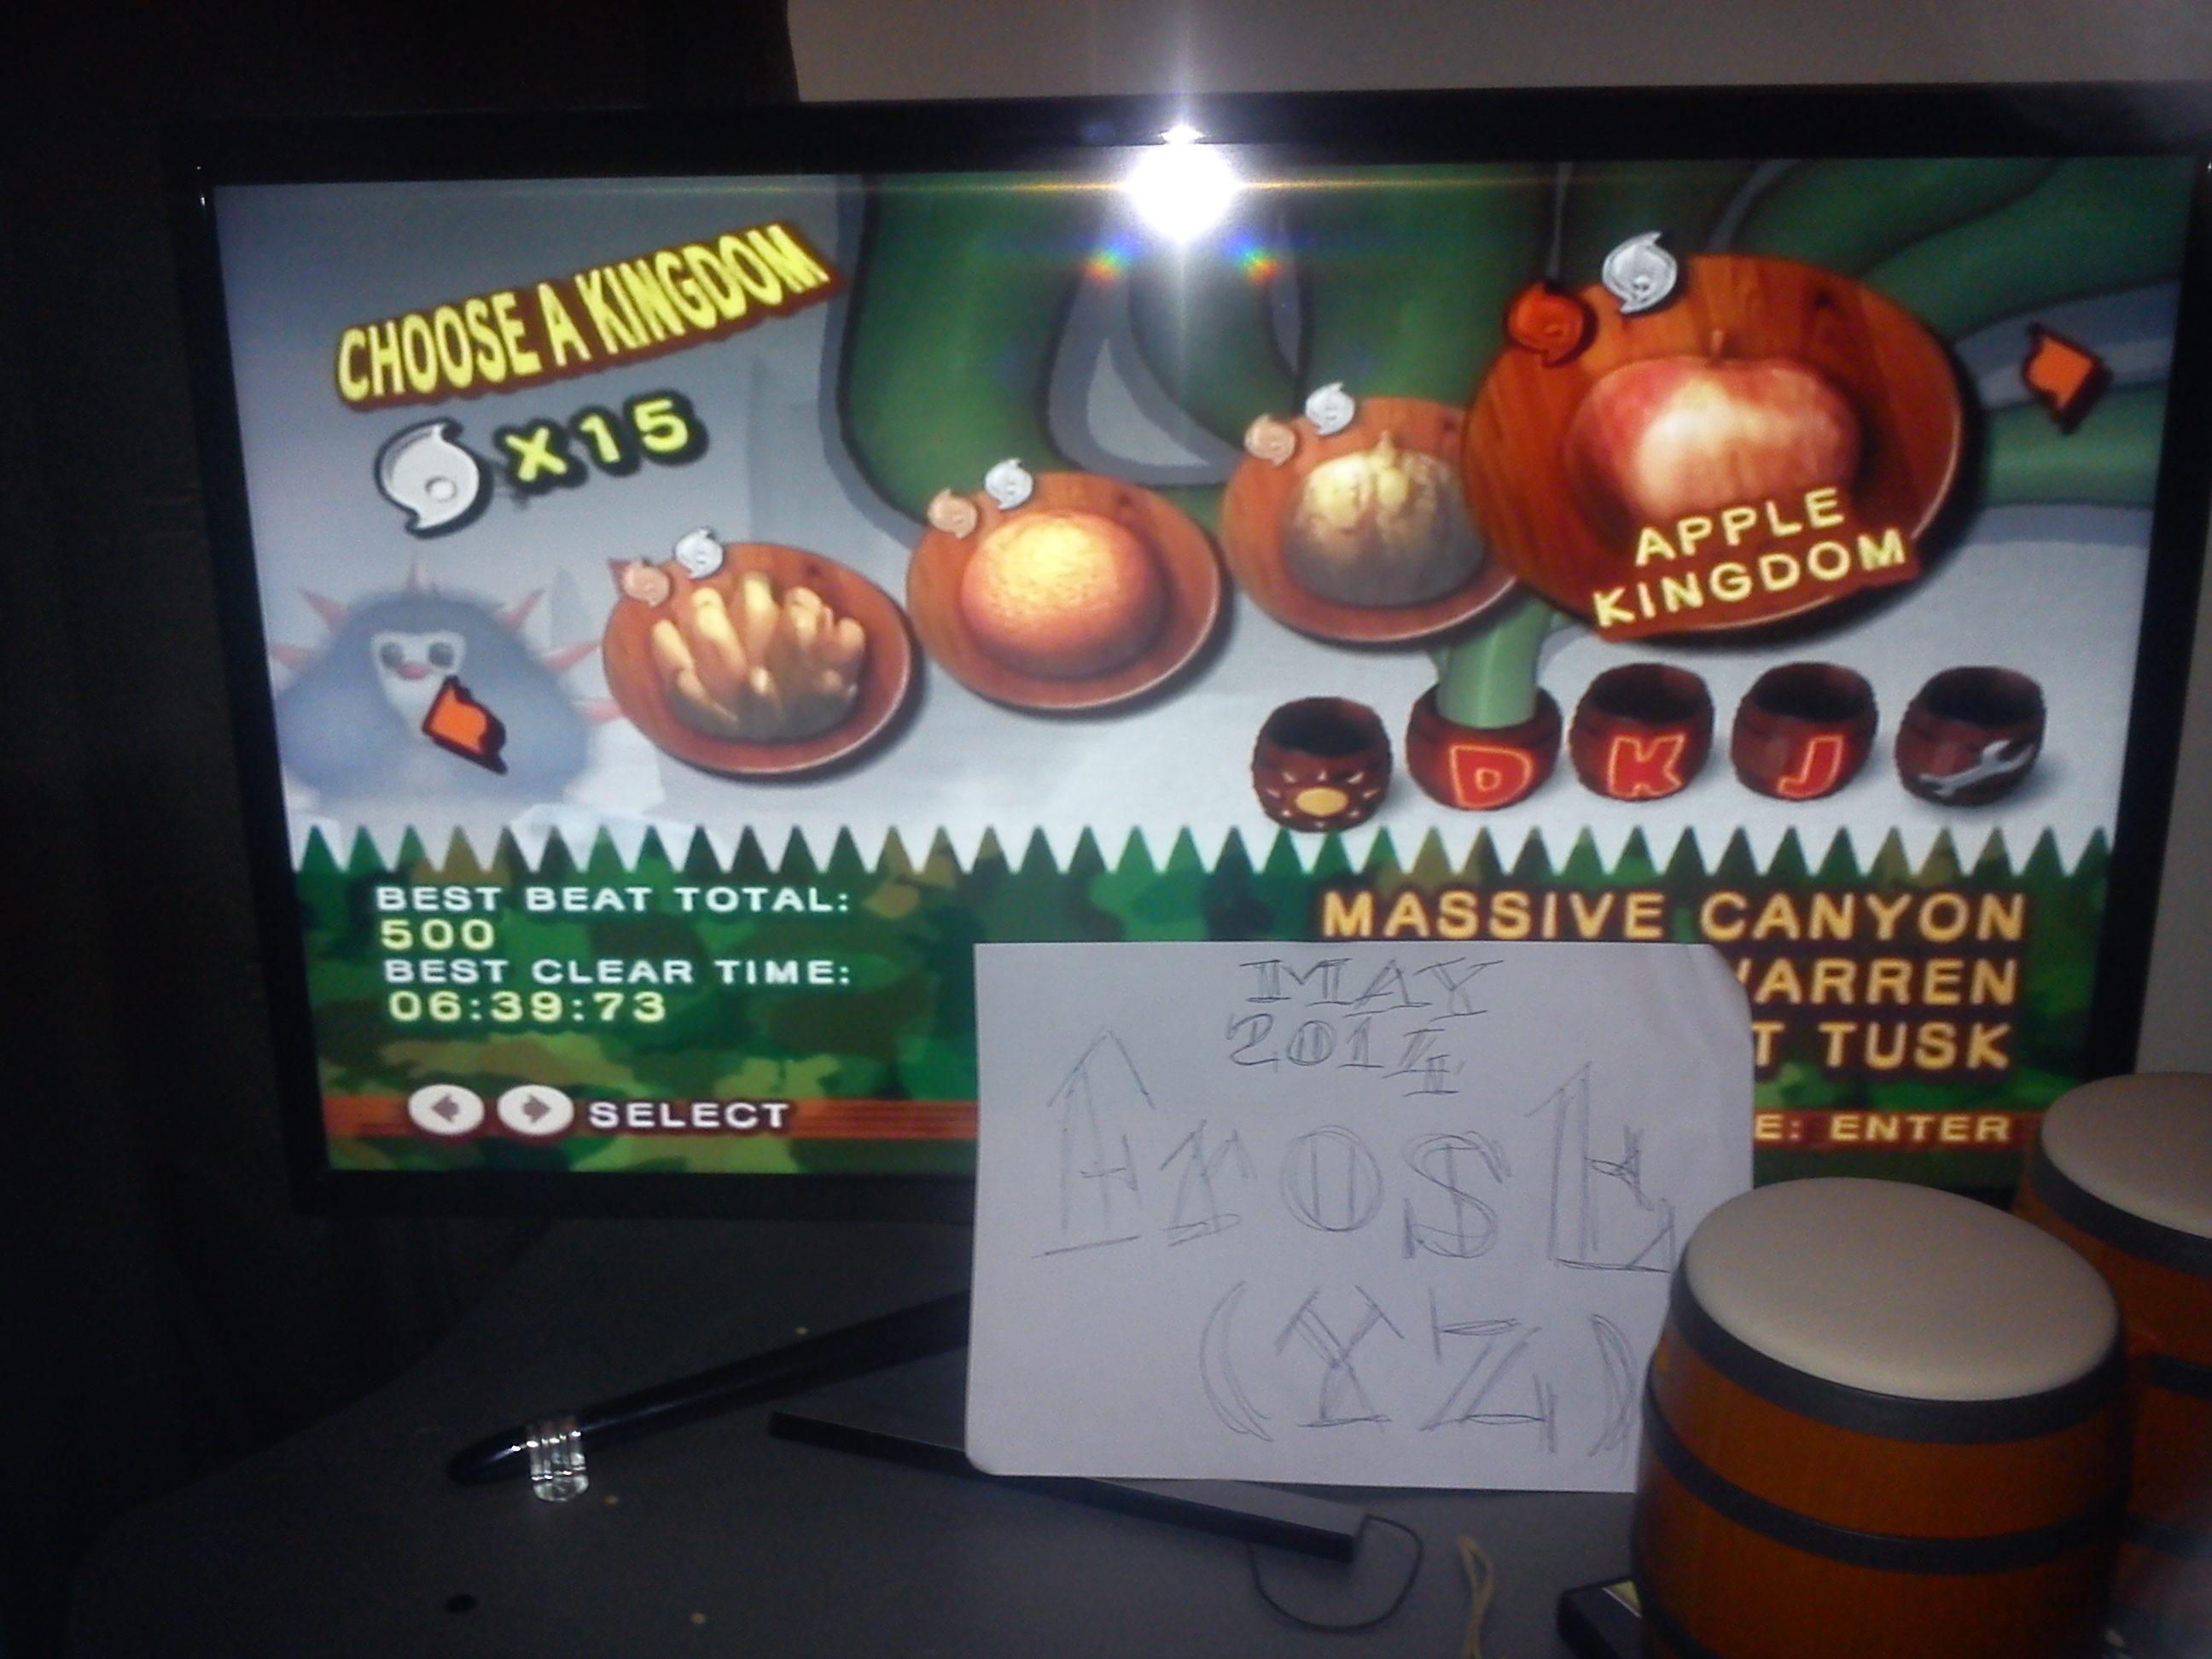 Donkey Kong Jungle Beat: Apple Kingdom [Shortest Time] time of 0:06:39.73